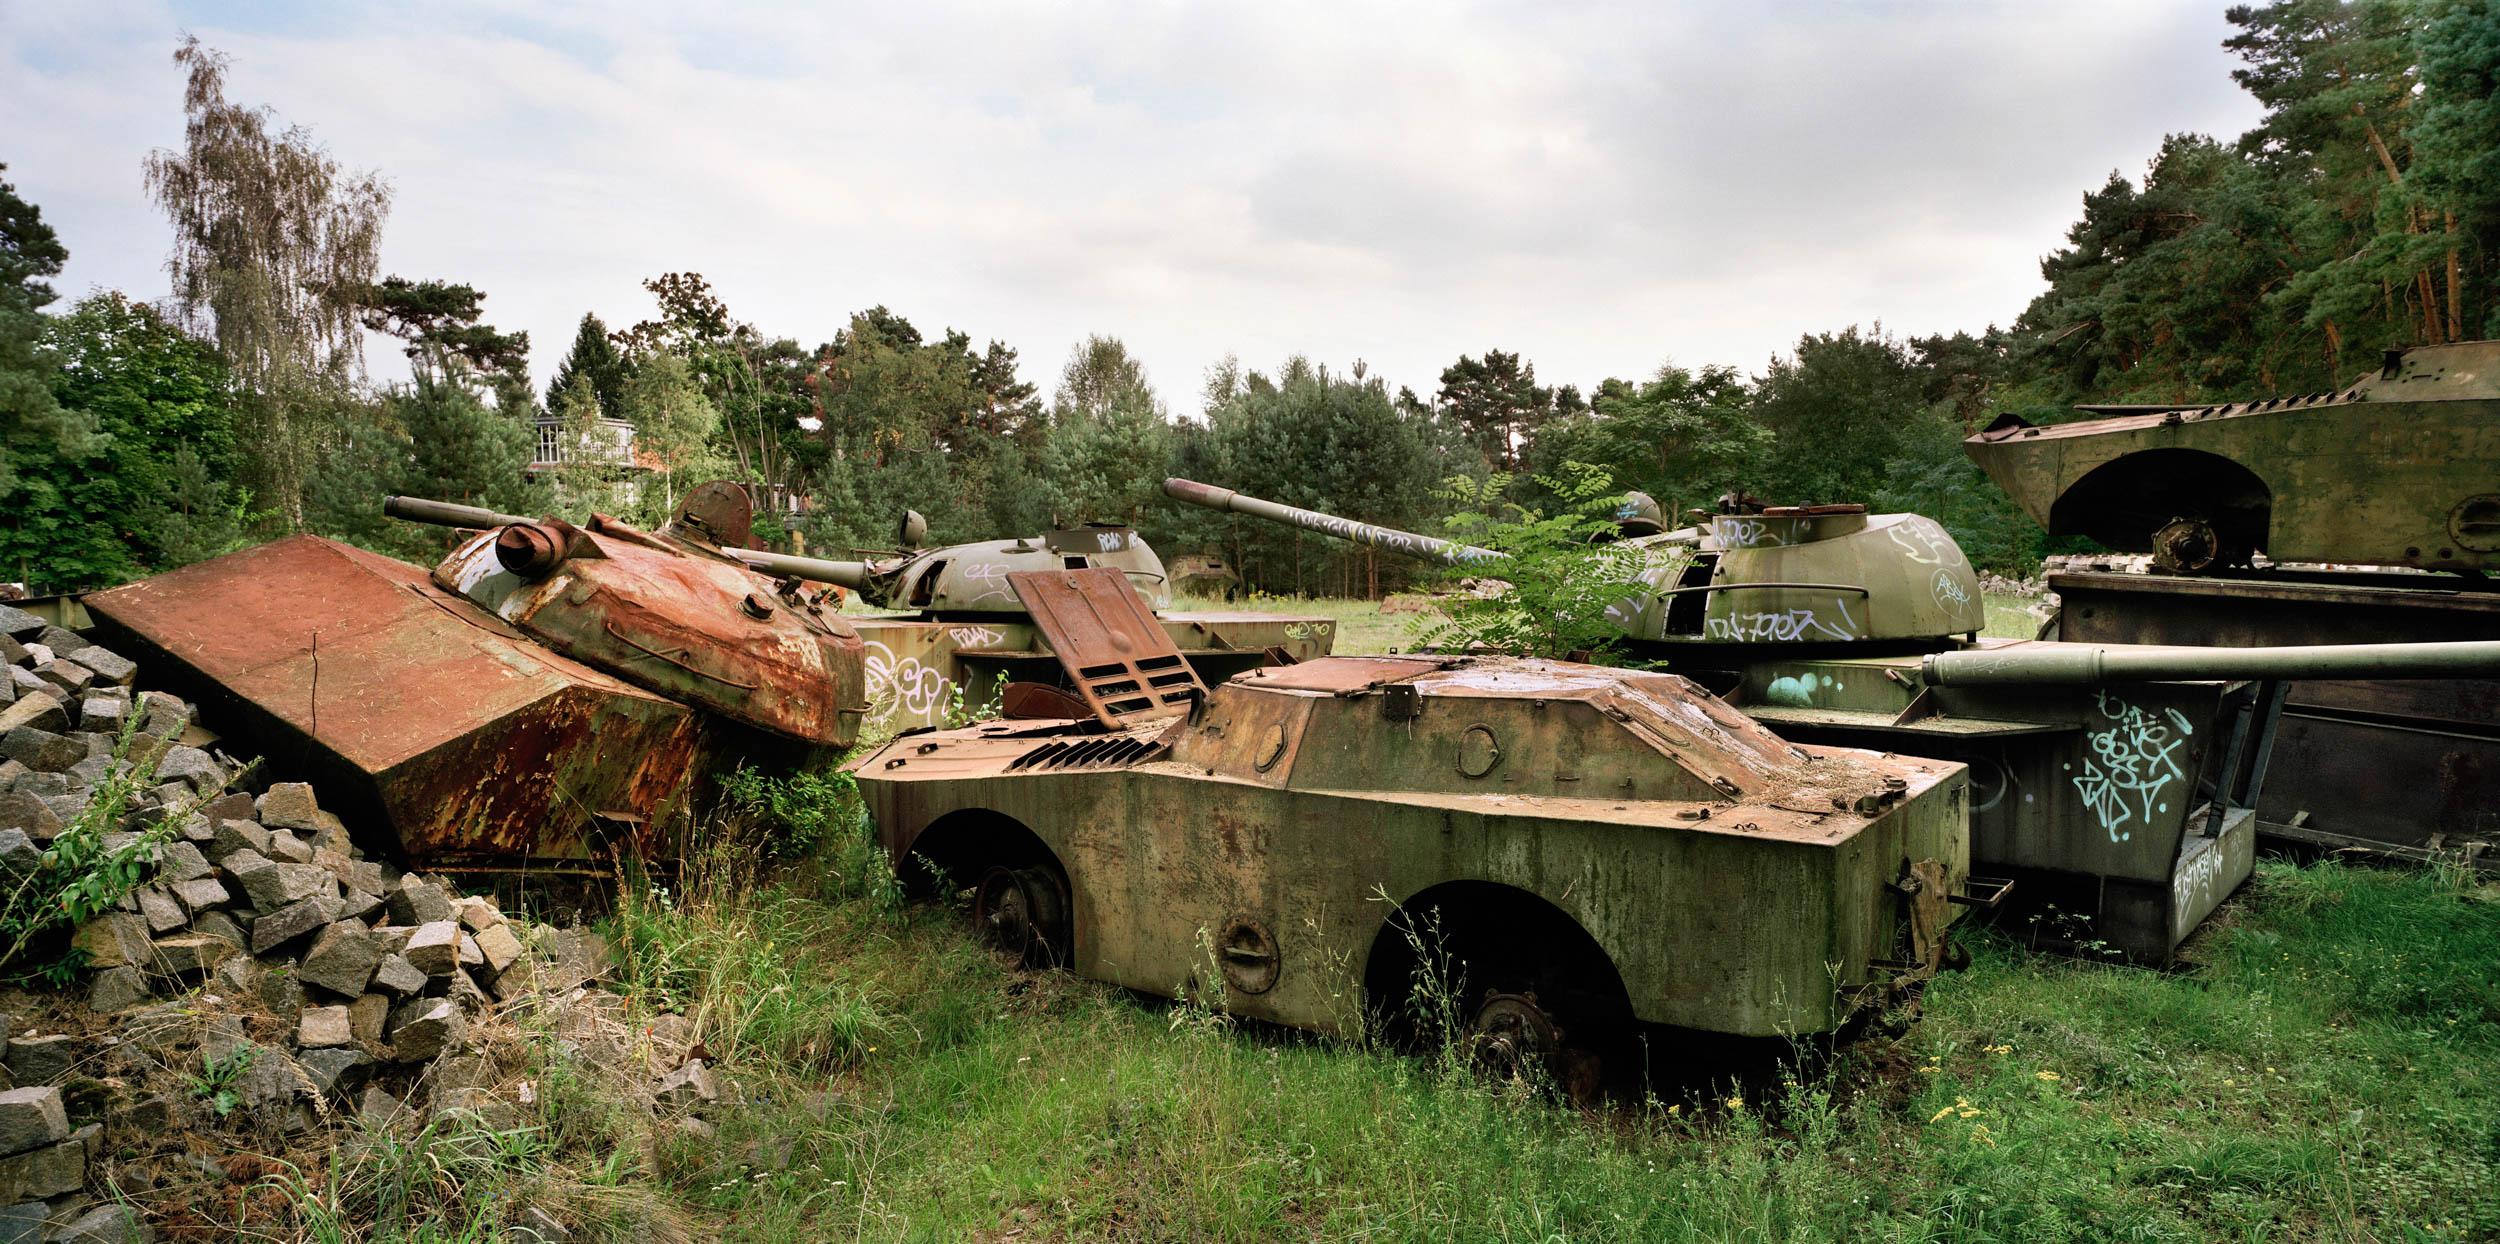 East Germany. Scrap metal tanks